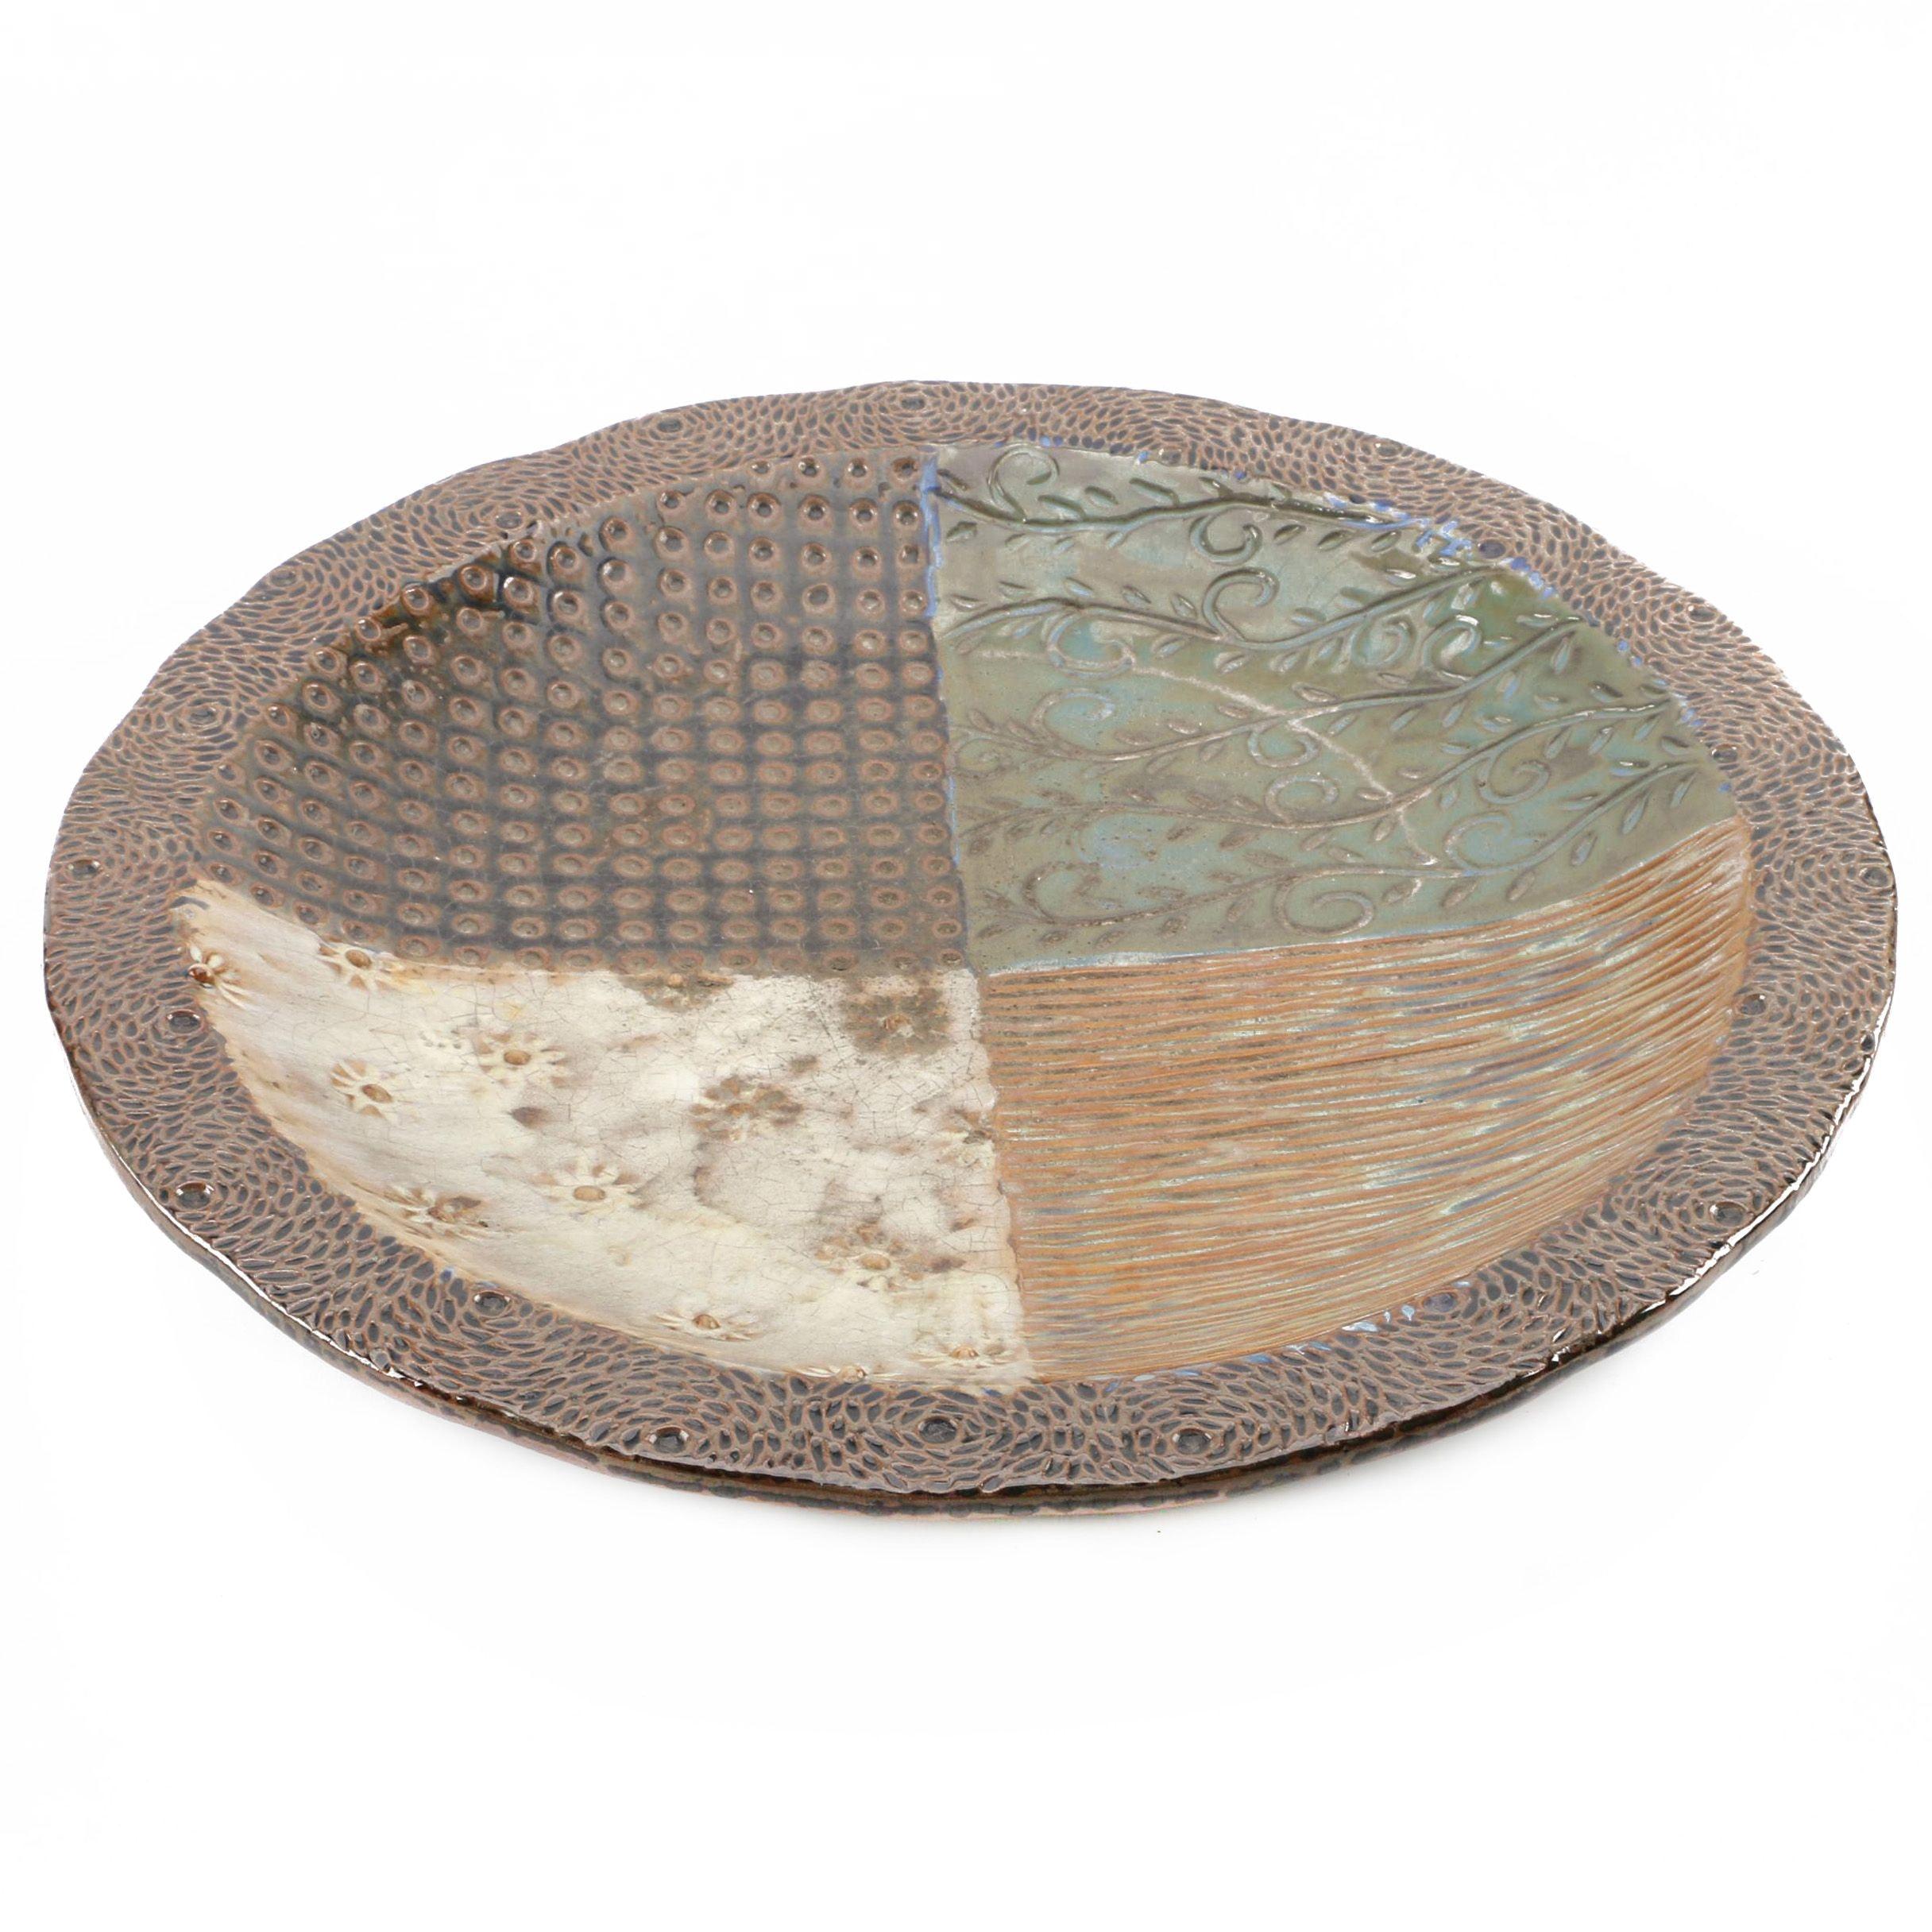 Large Decorative Ceramic Plate ...  sc 1 st  EBTH.com & Large Decorative Ceramic Plate : EBTH